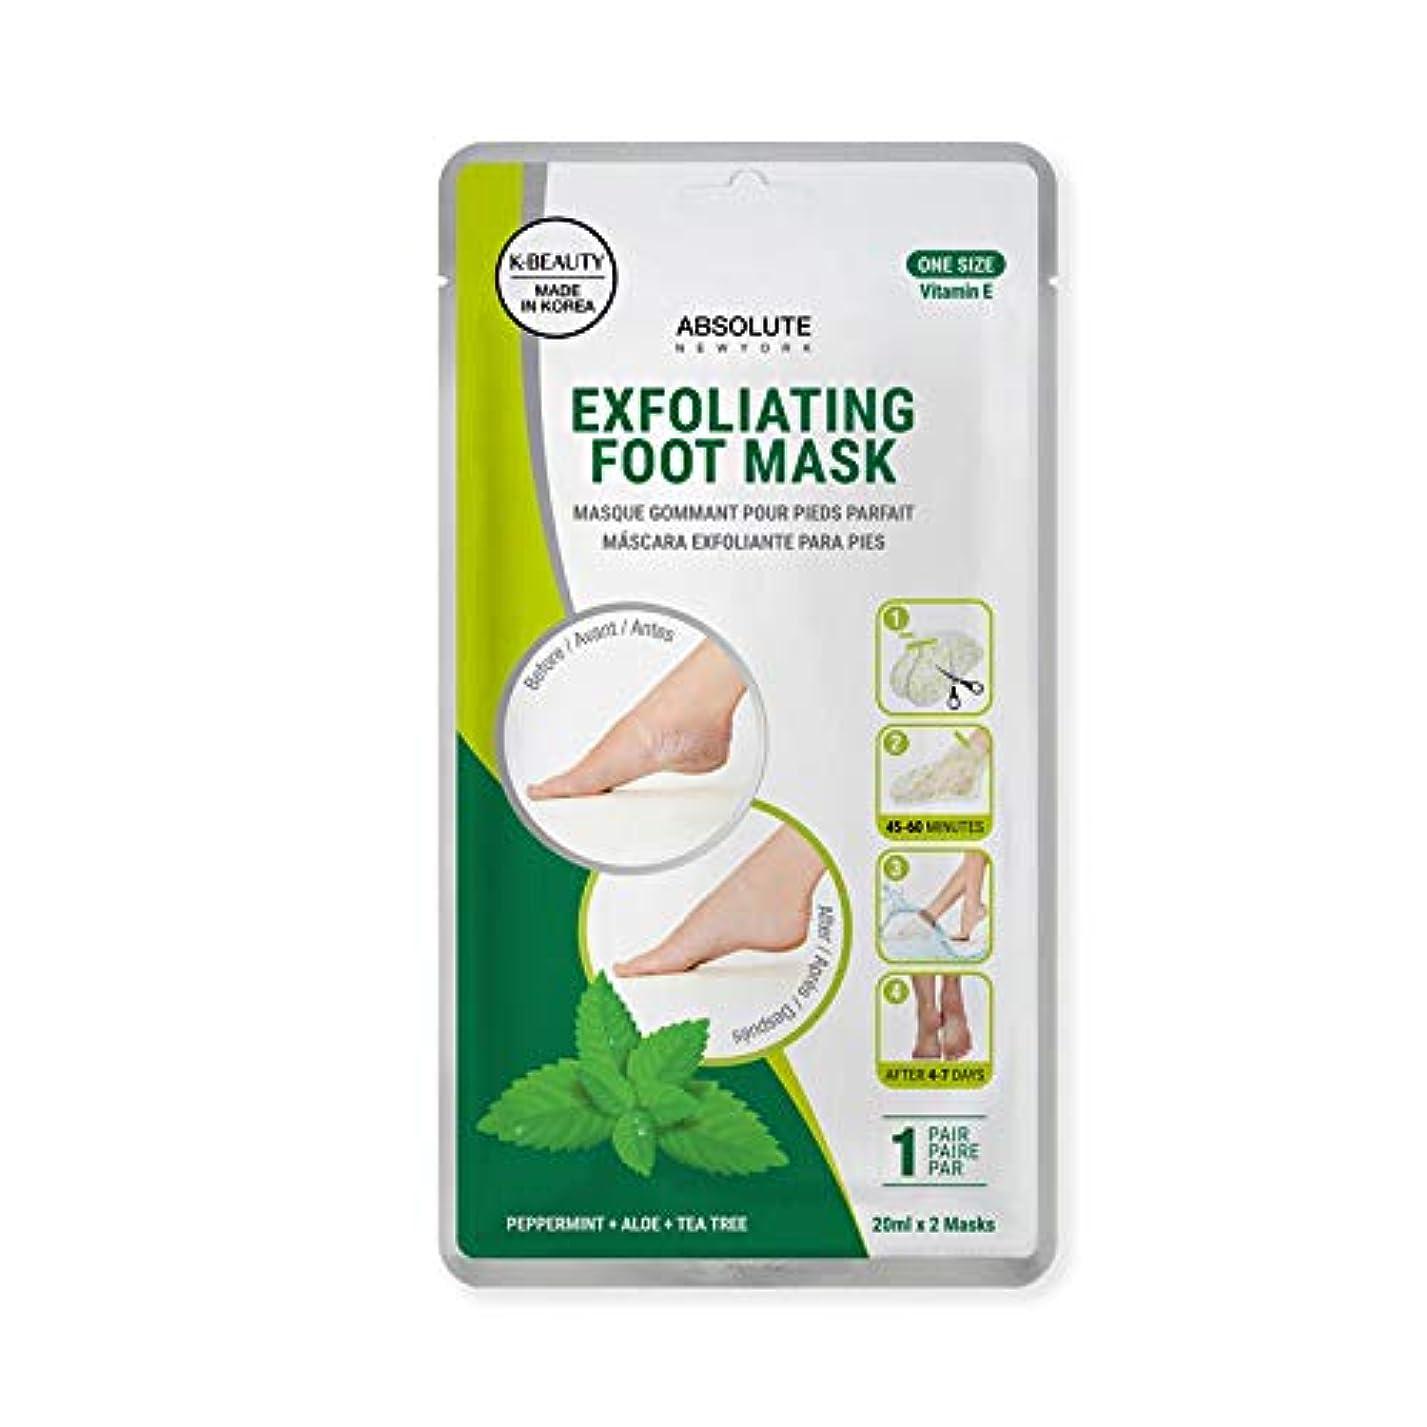 ABSOLUTE Exfoliating Foot Mask - Peppermint + Aloe + Tea Tree (並行輸入品)